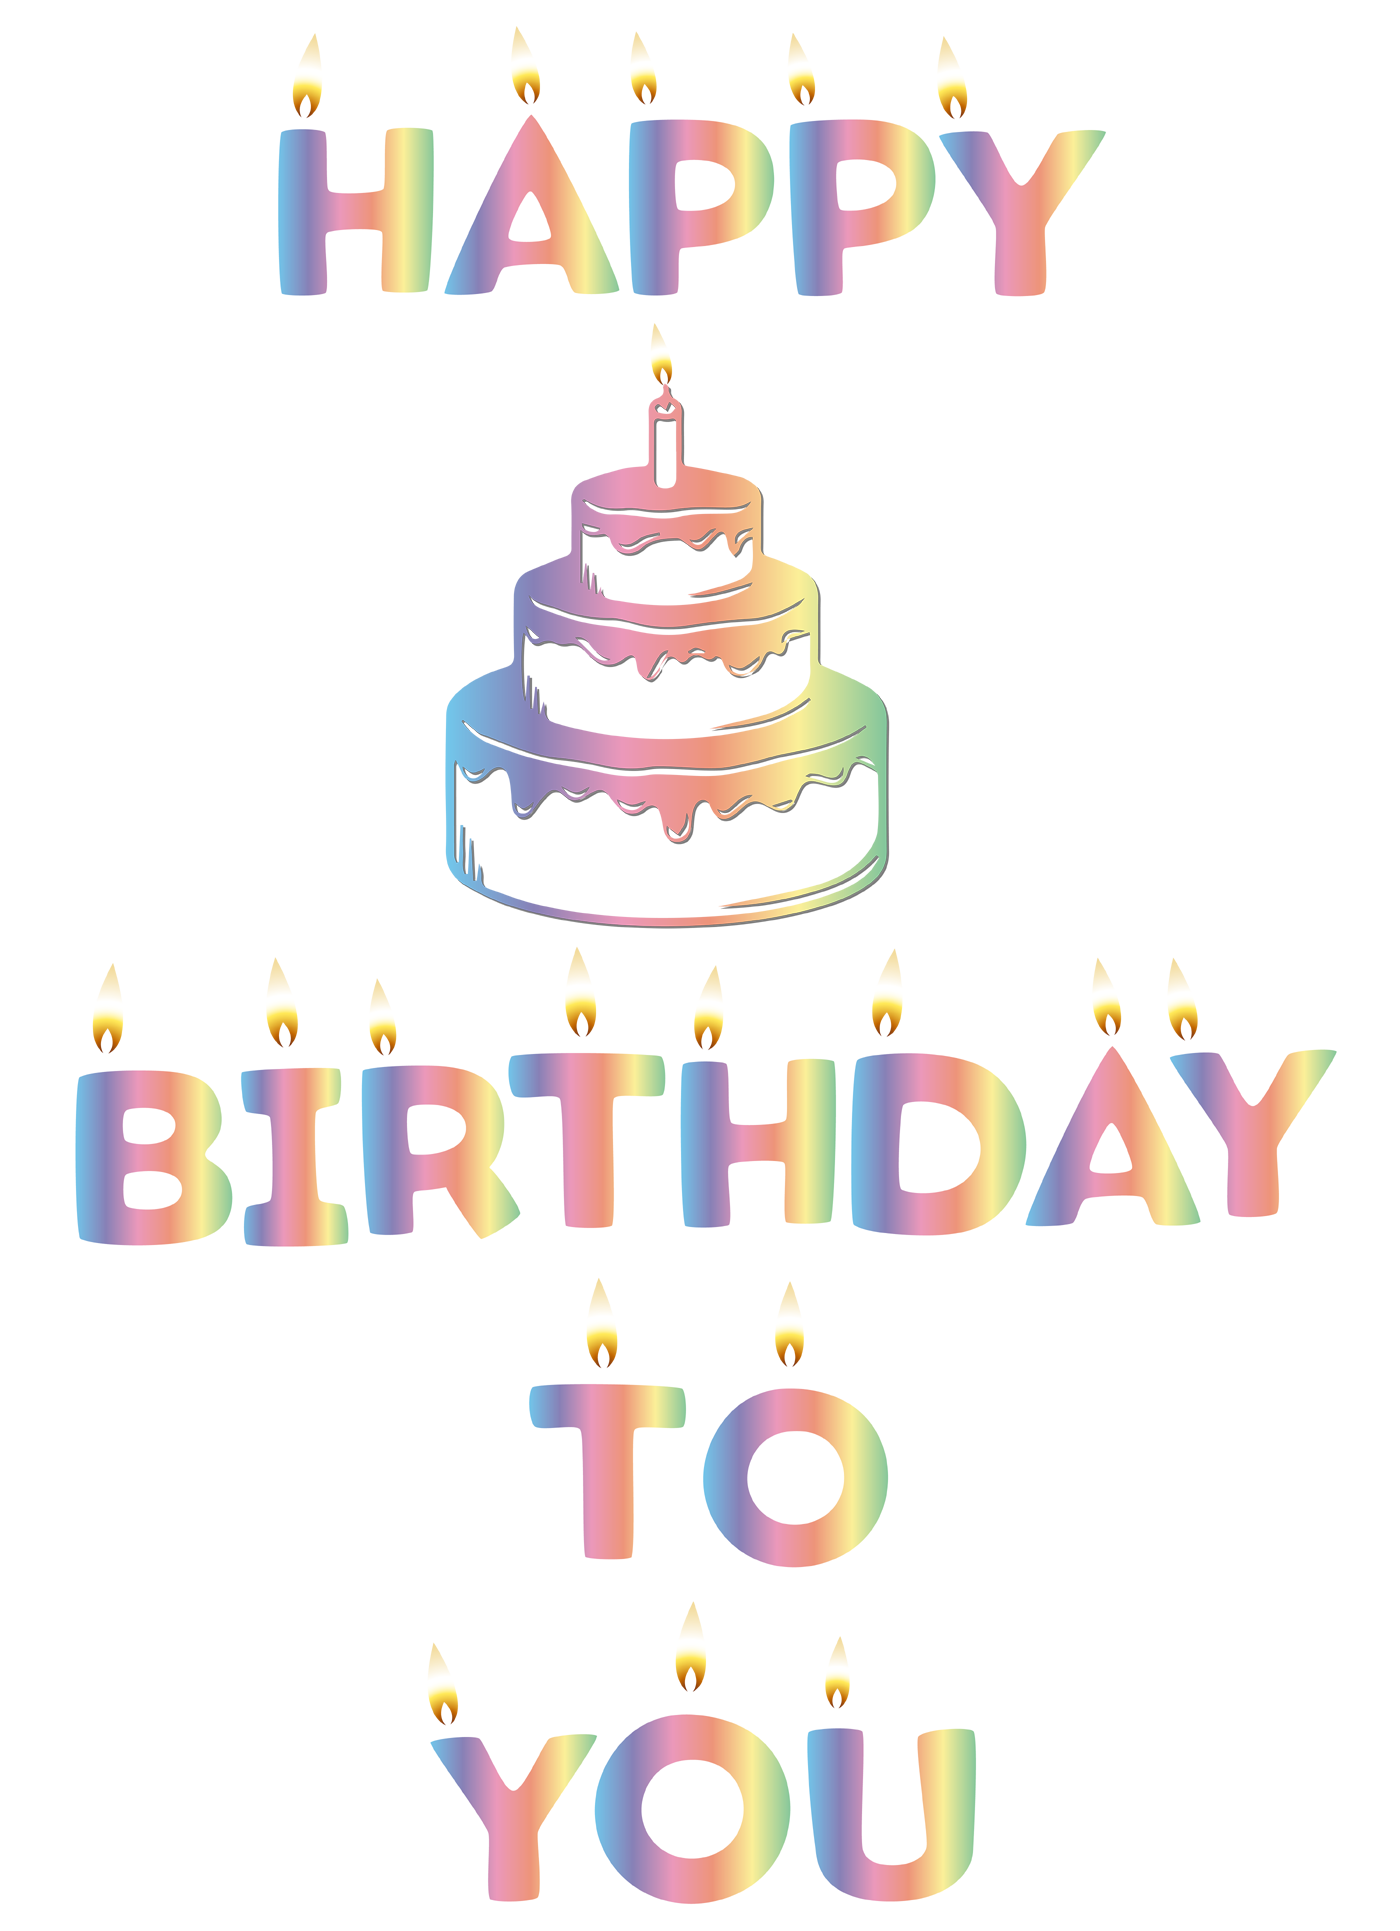 Decoration clipart happy birthday. Text art design in